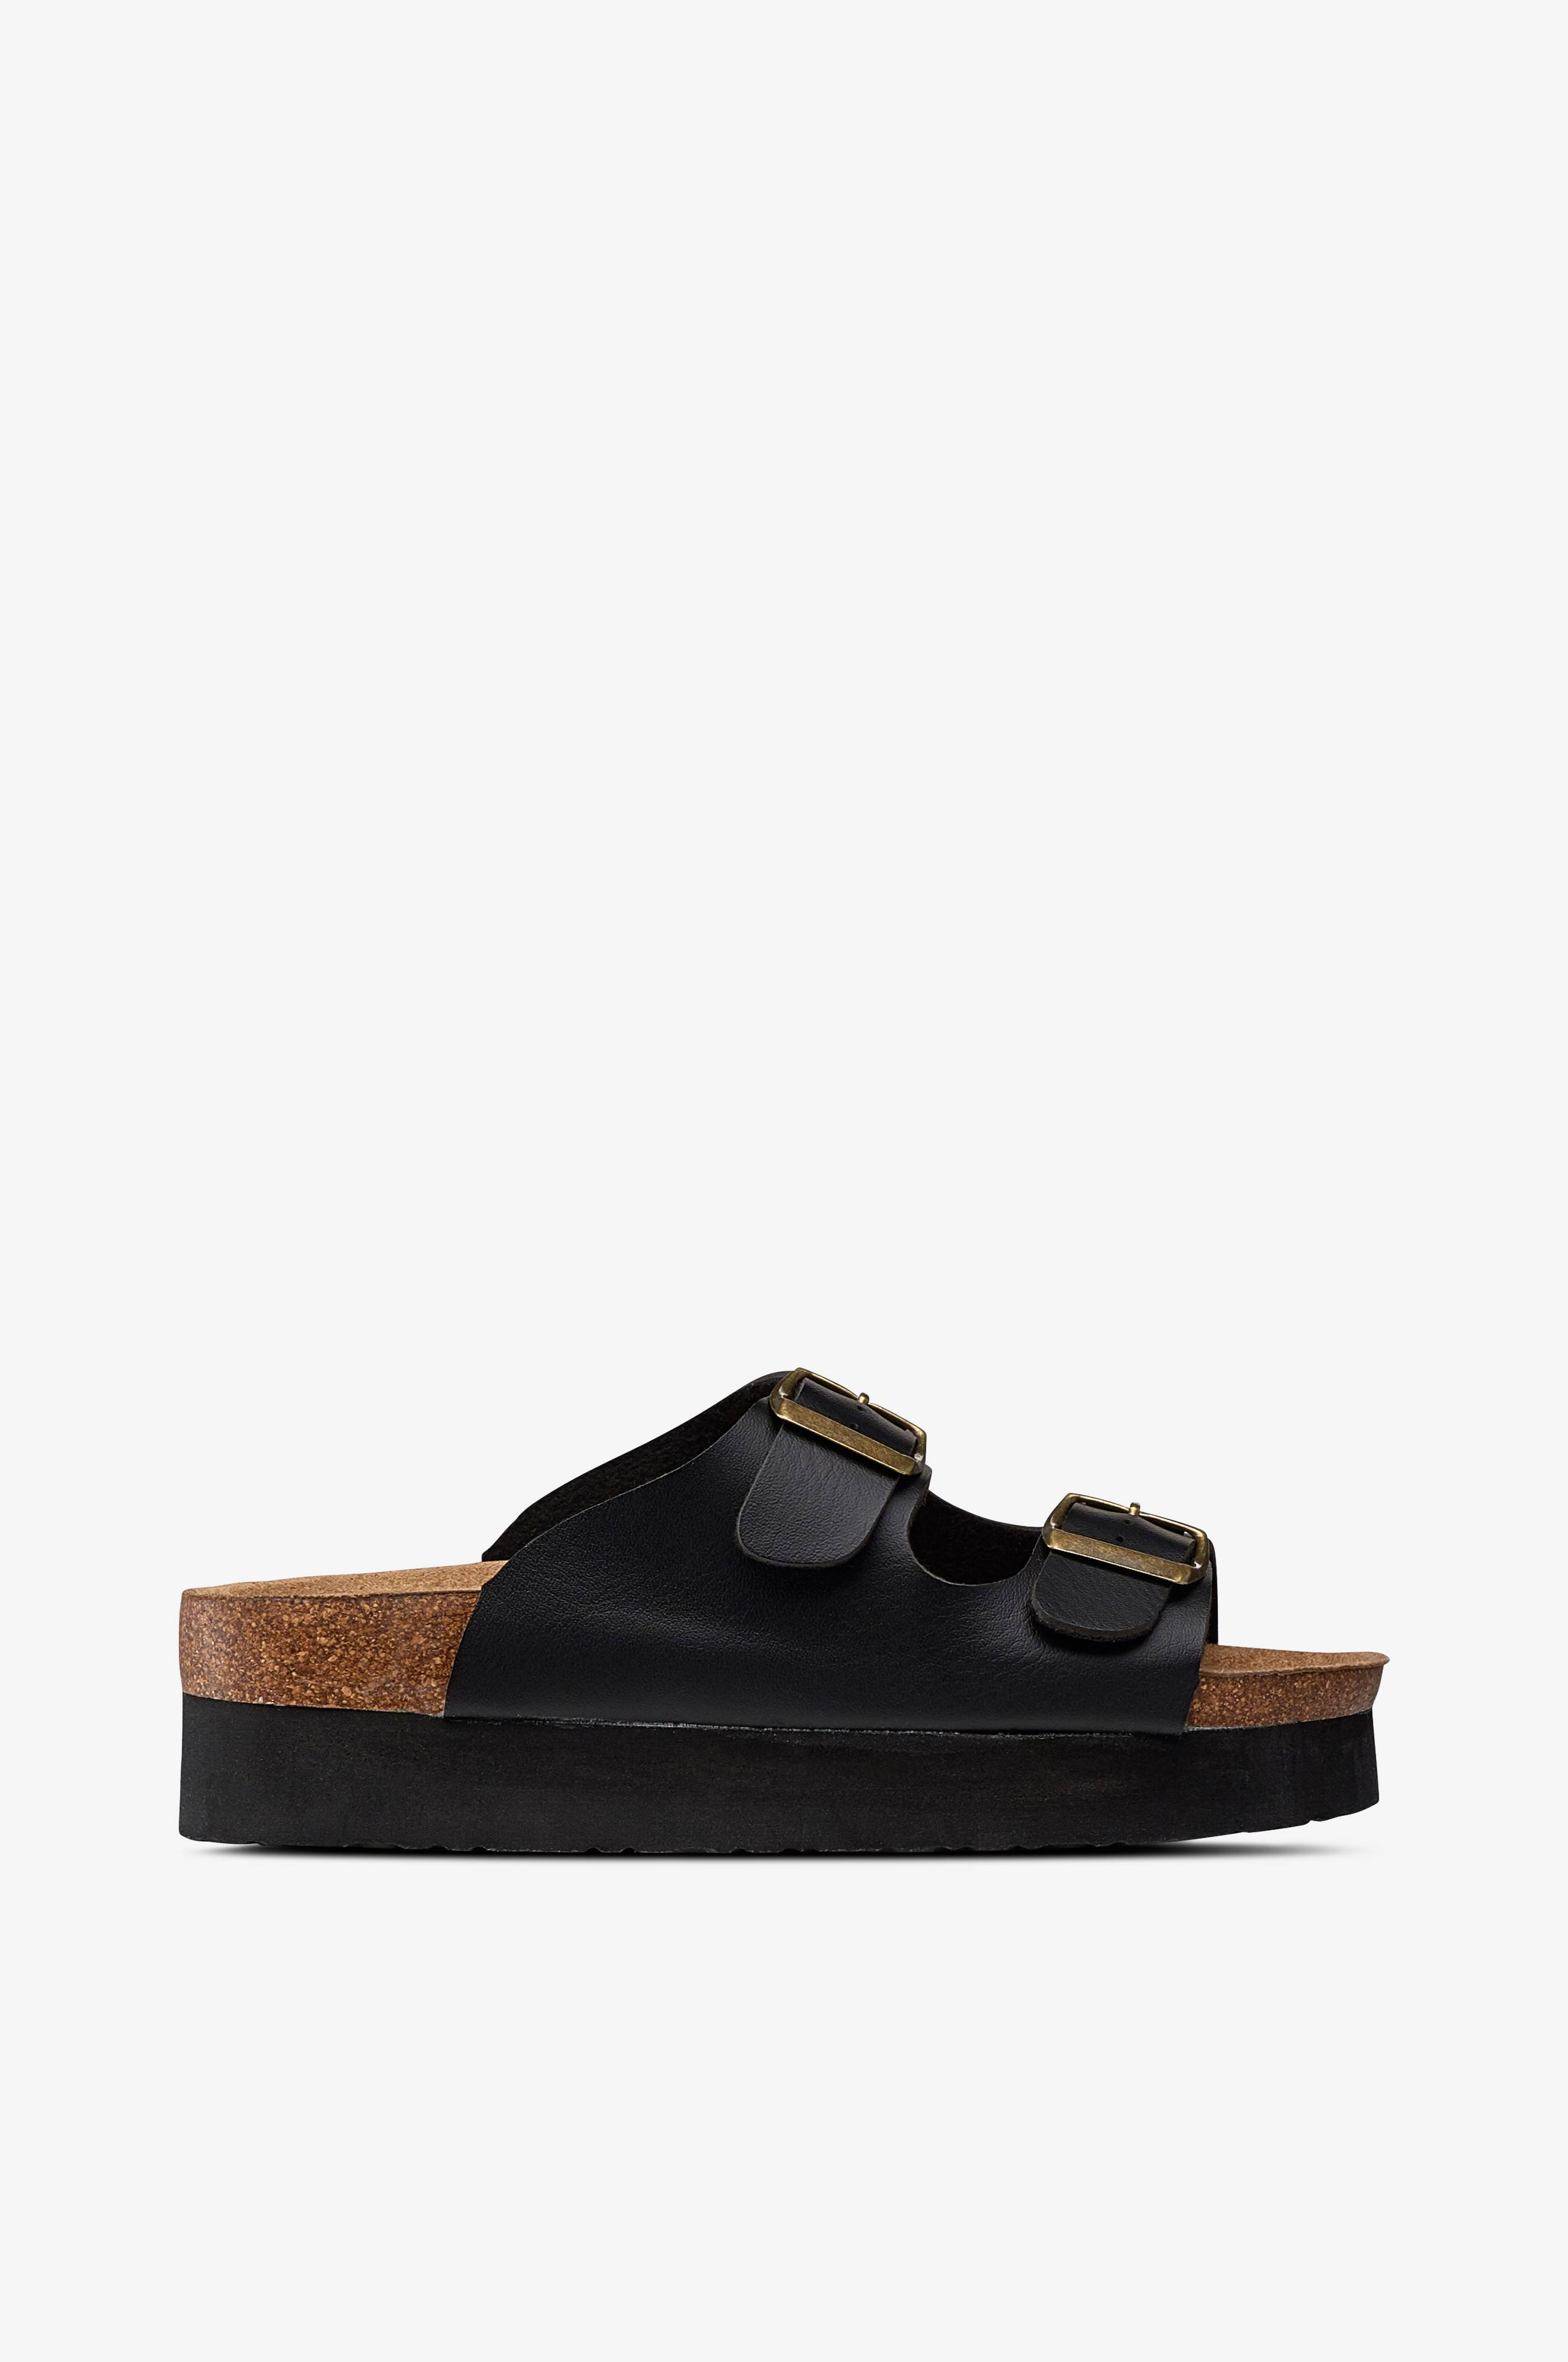 Duffy sandal mhøj hæl, sort